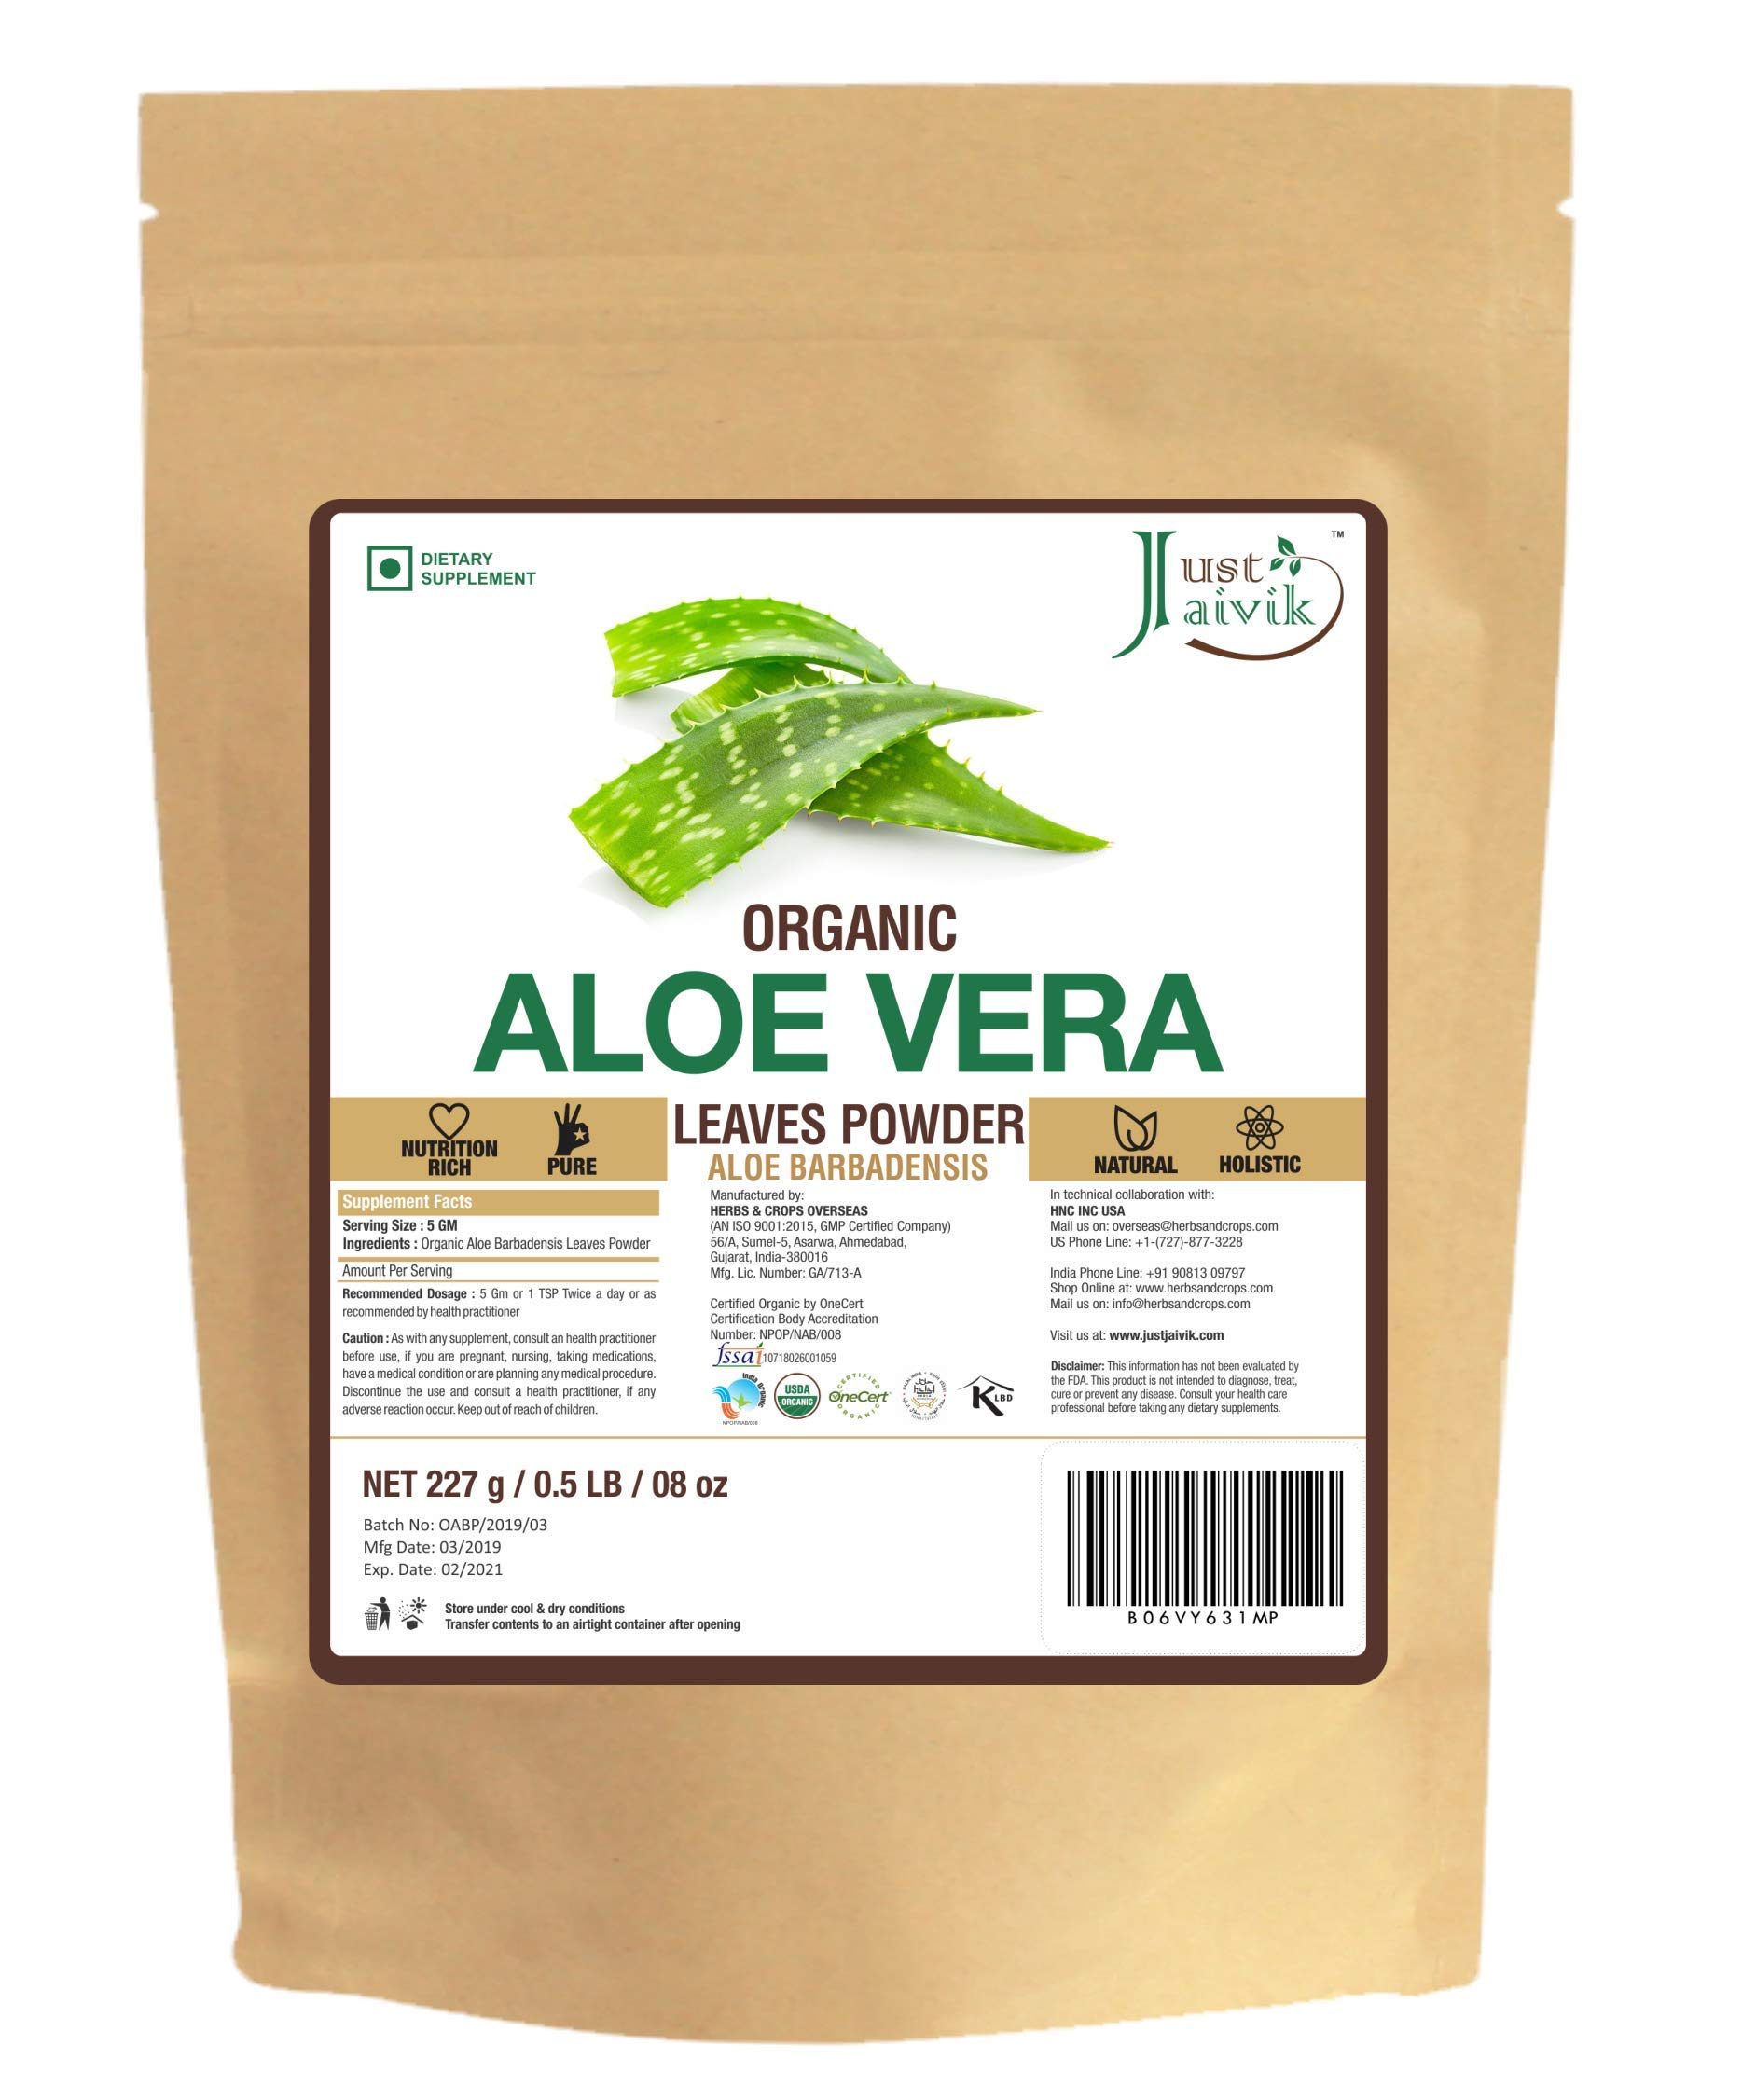 100% Organic Aloe Vera Powder - 227g/0.5 LB USDA Organic Certified (Aloe Barbadensis) for